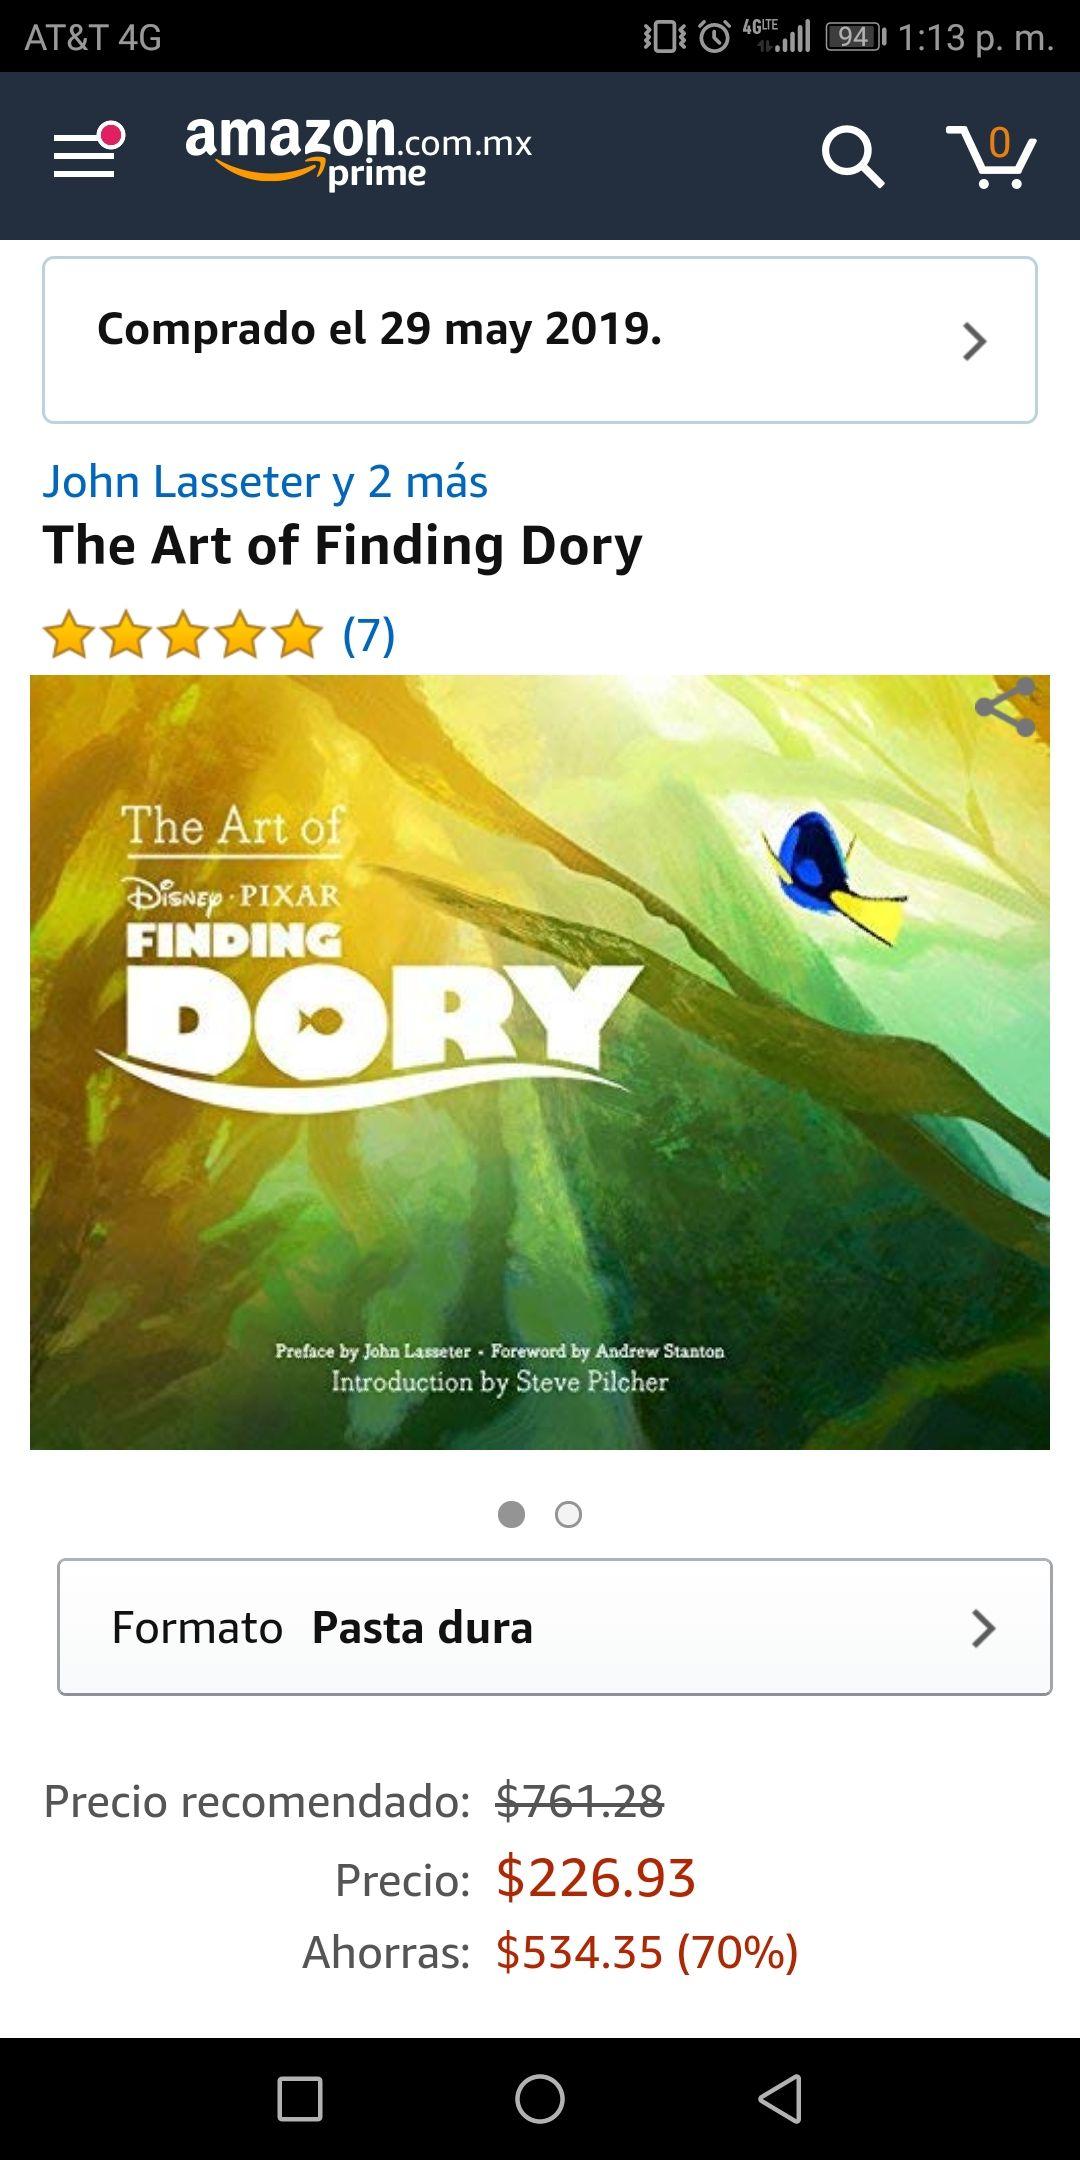 Amazon - Libro The Art of Finding Dory